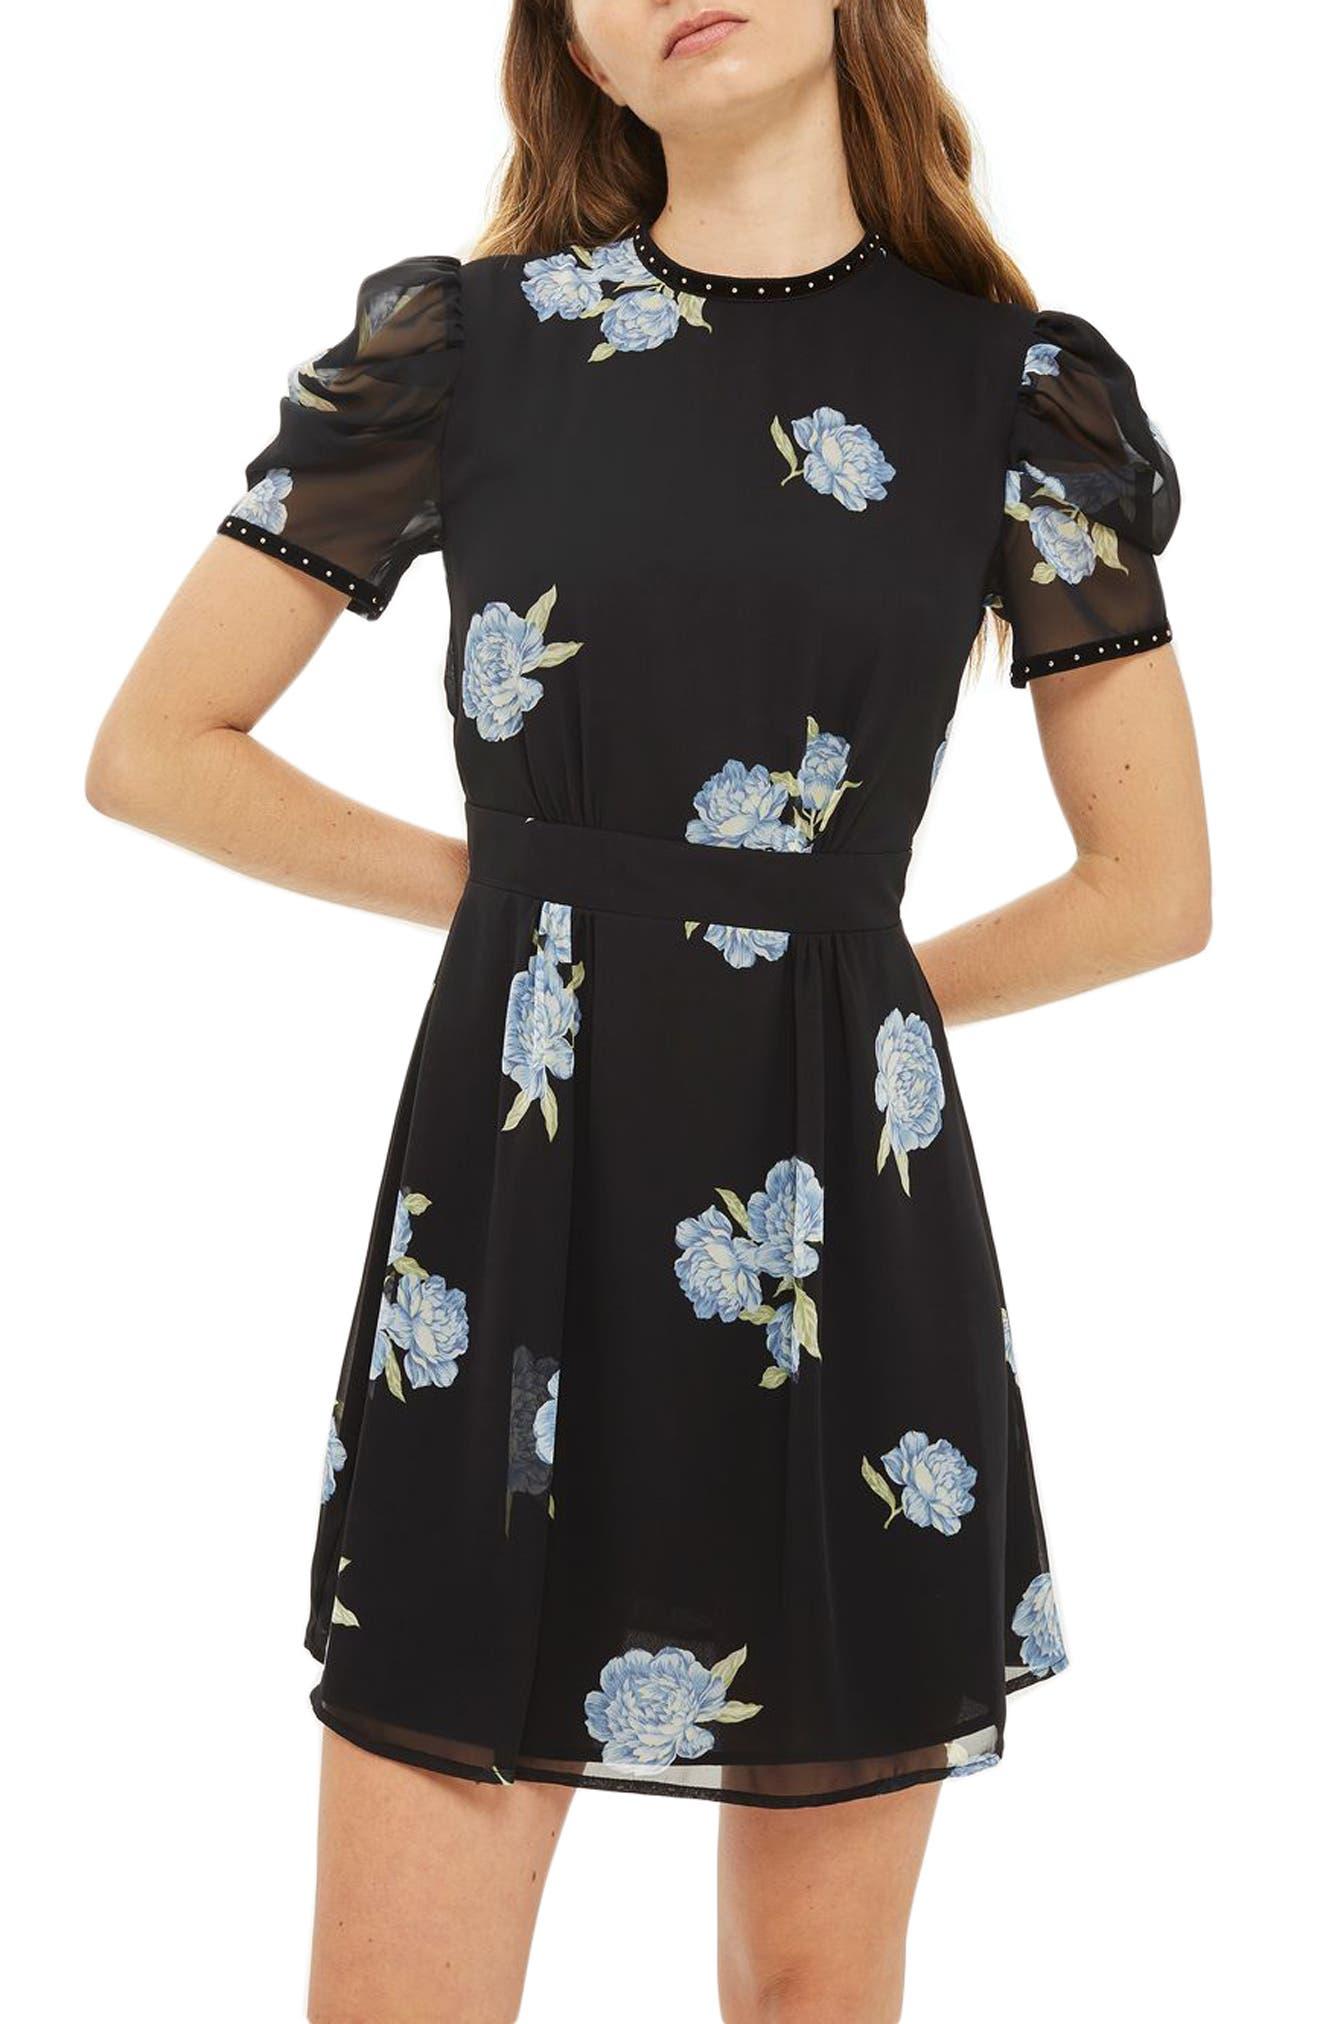 Topshop Bloom Studded Puff Sleeve Skater Dress